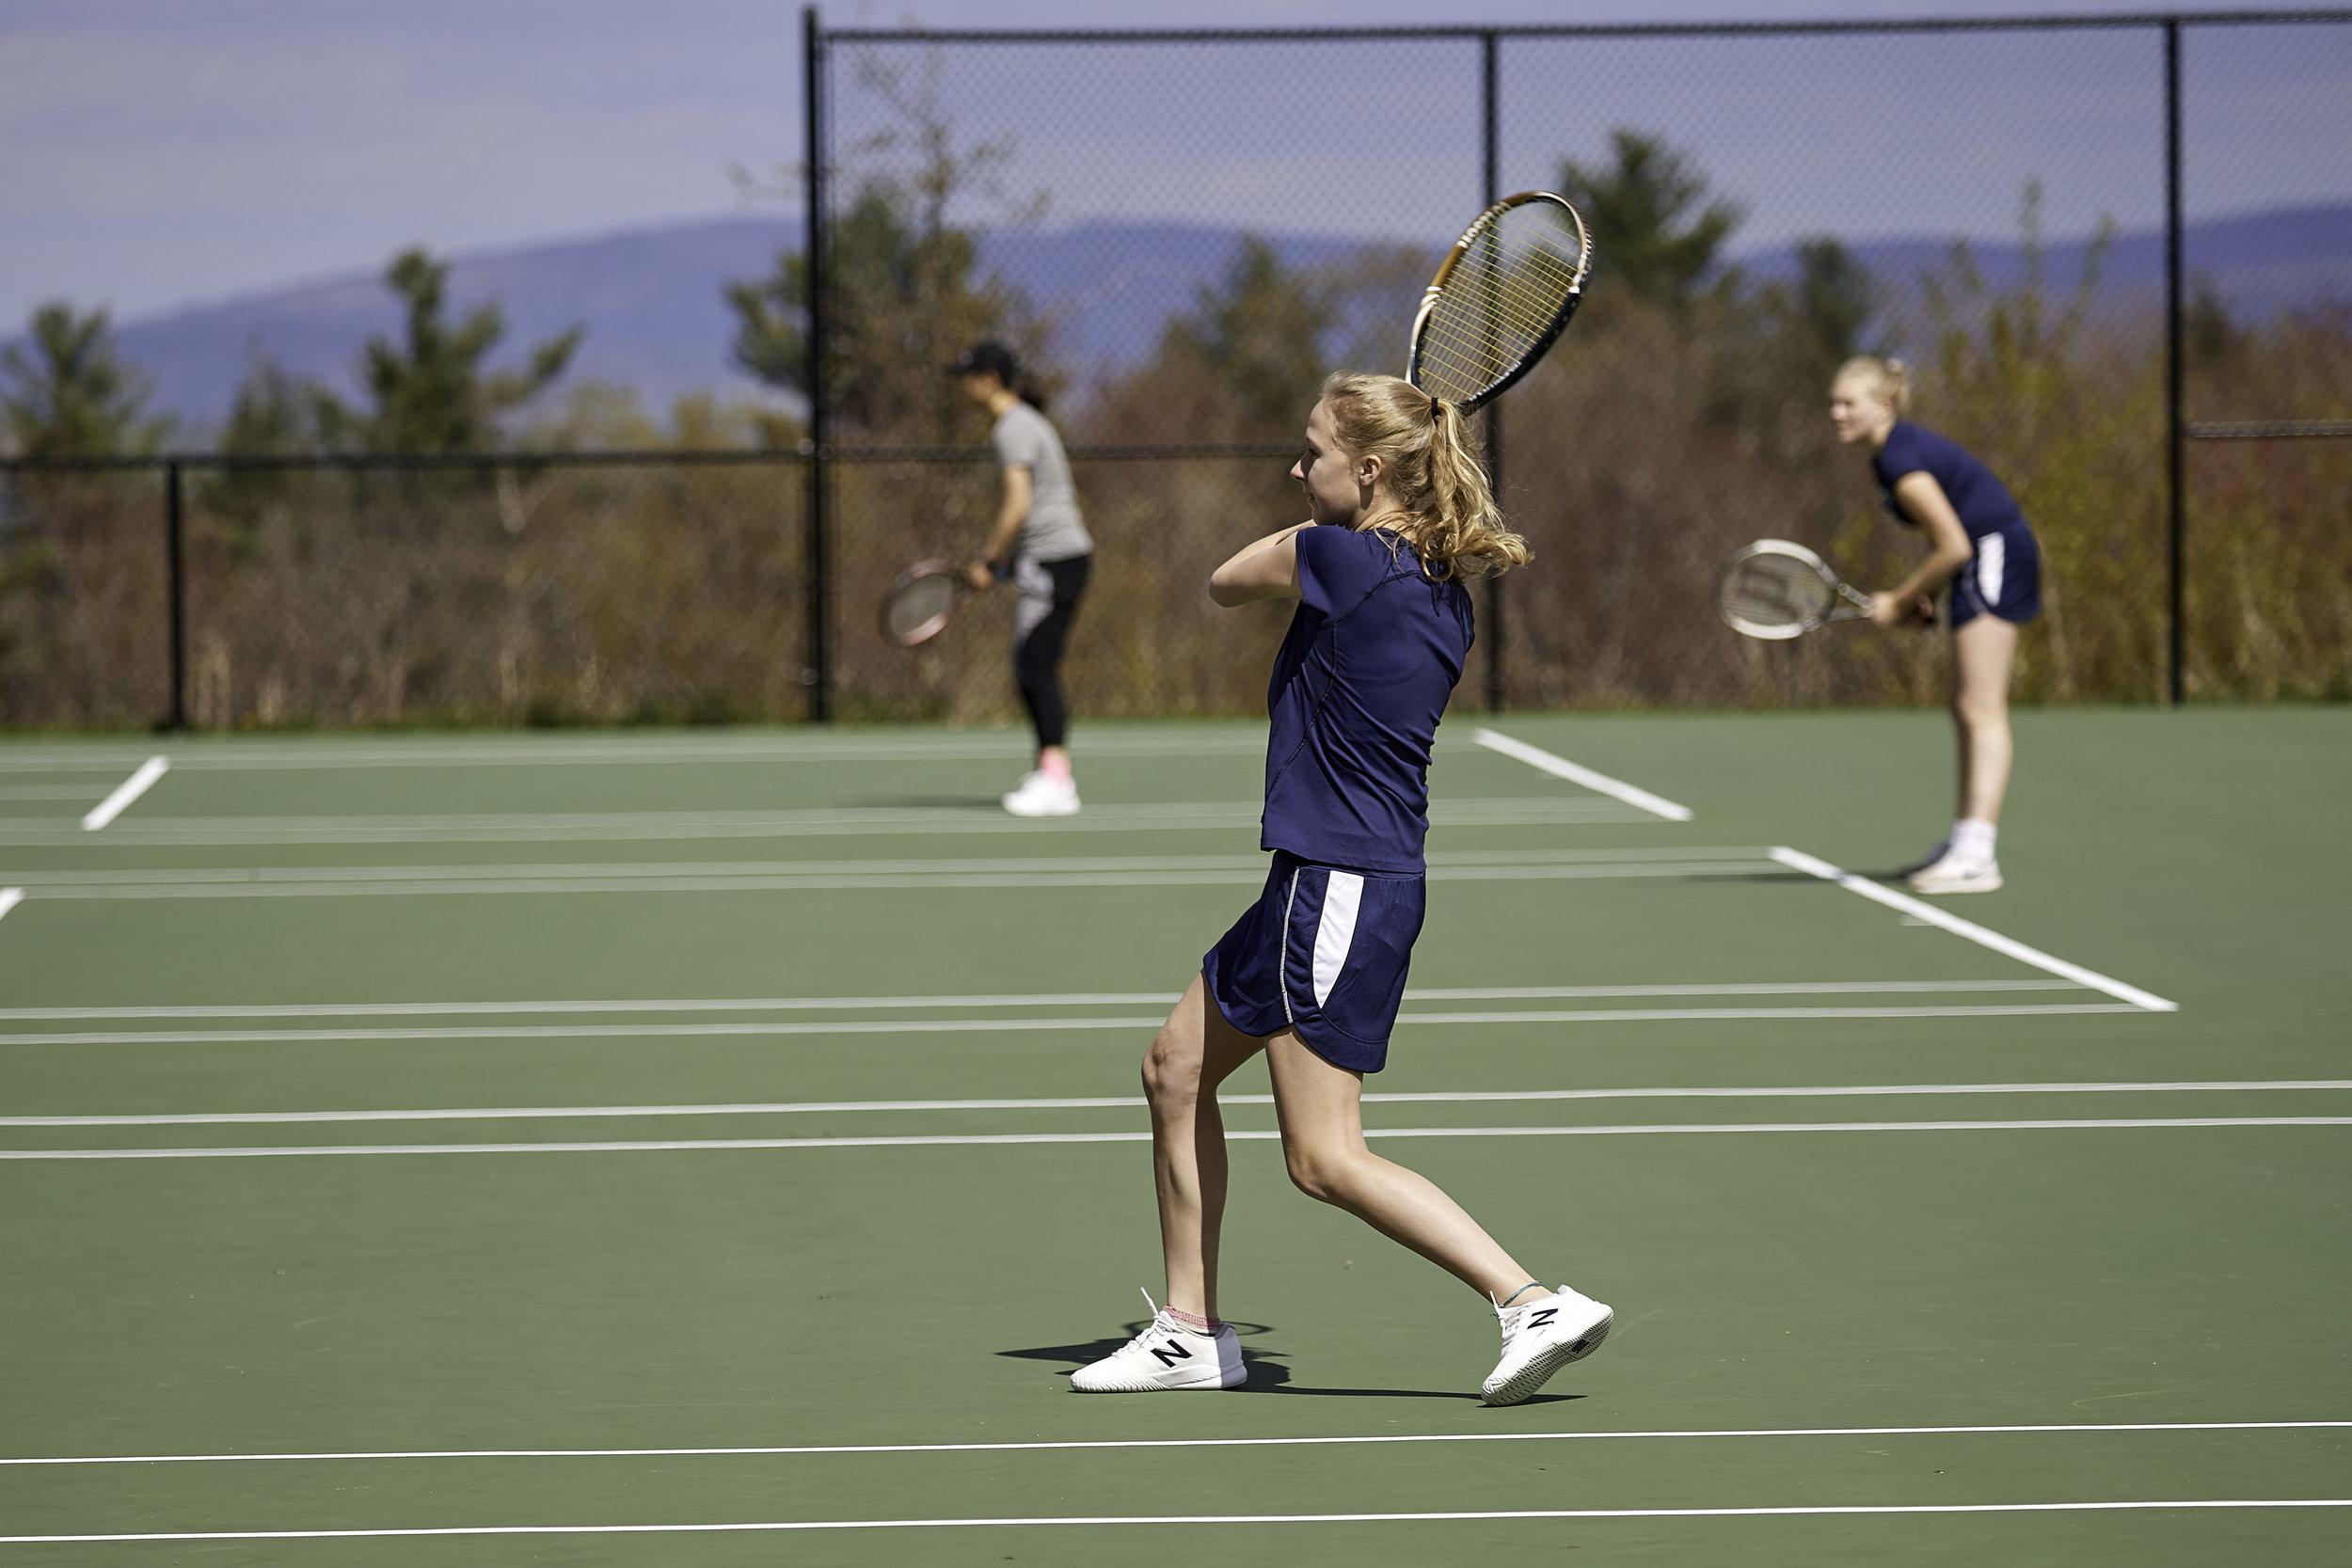 Girls Tennis vs. Winchendon School - May 15, 2019 -195182.jpg